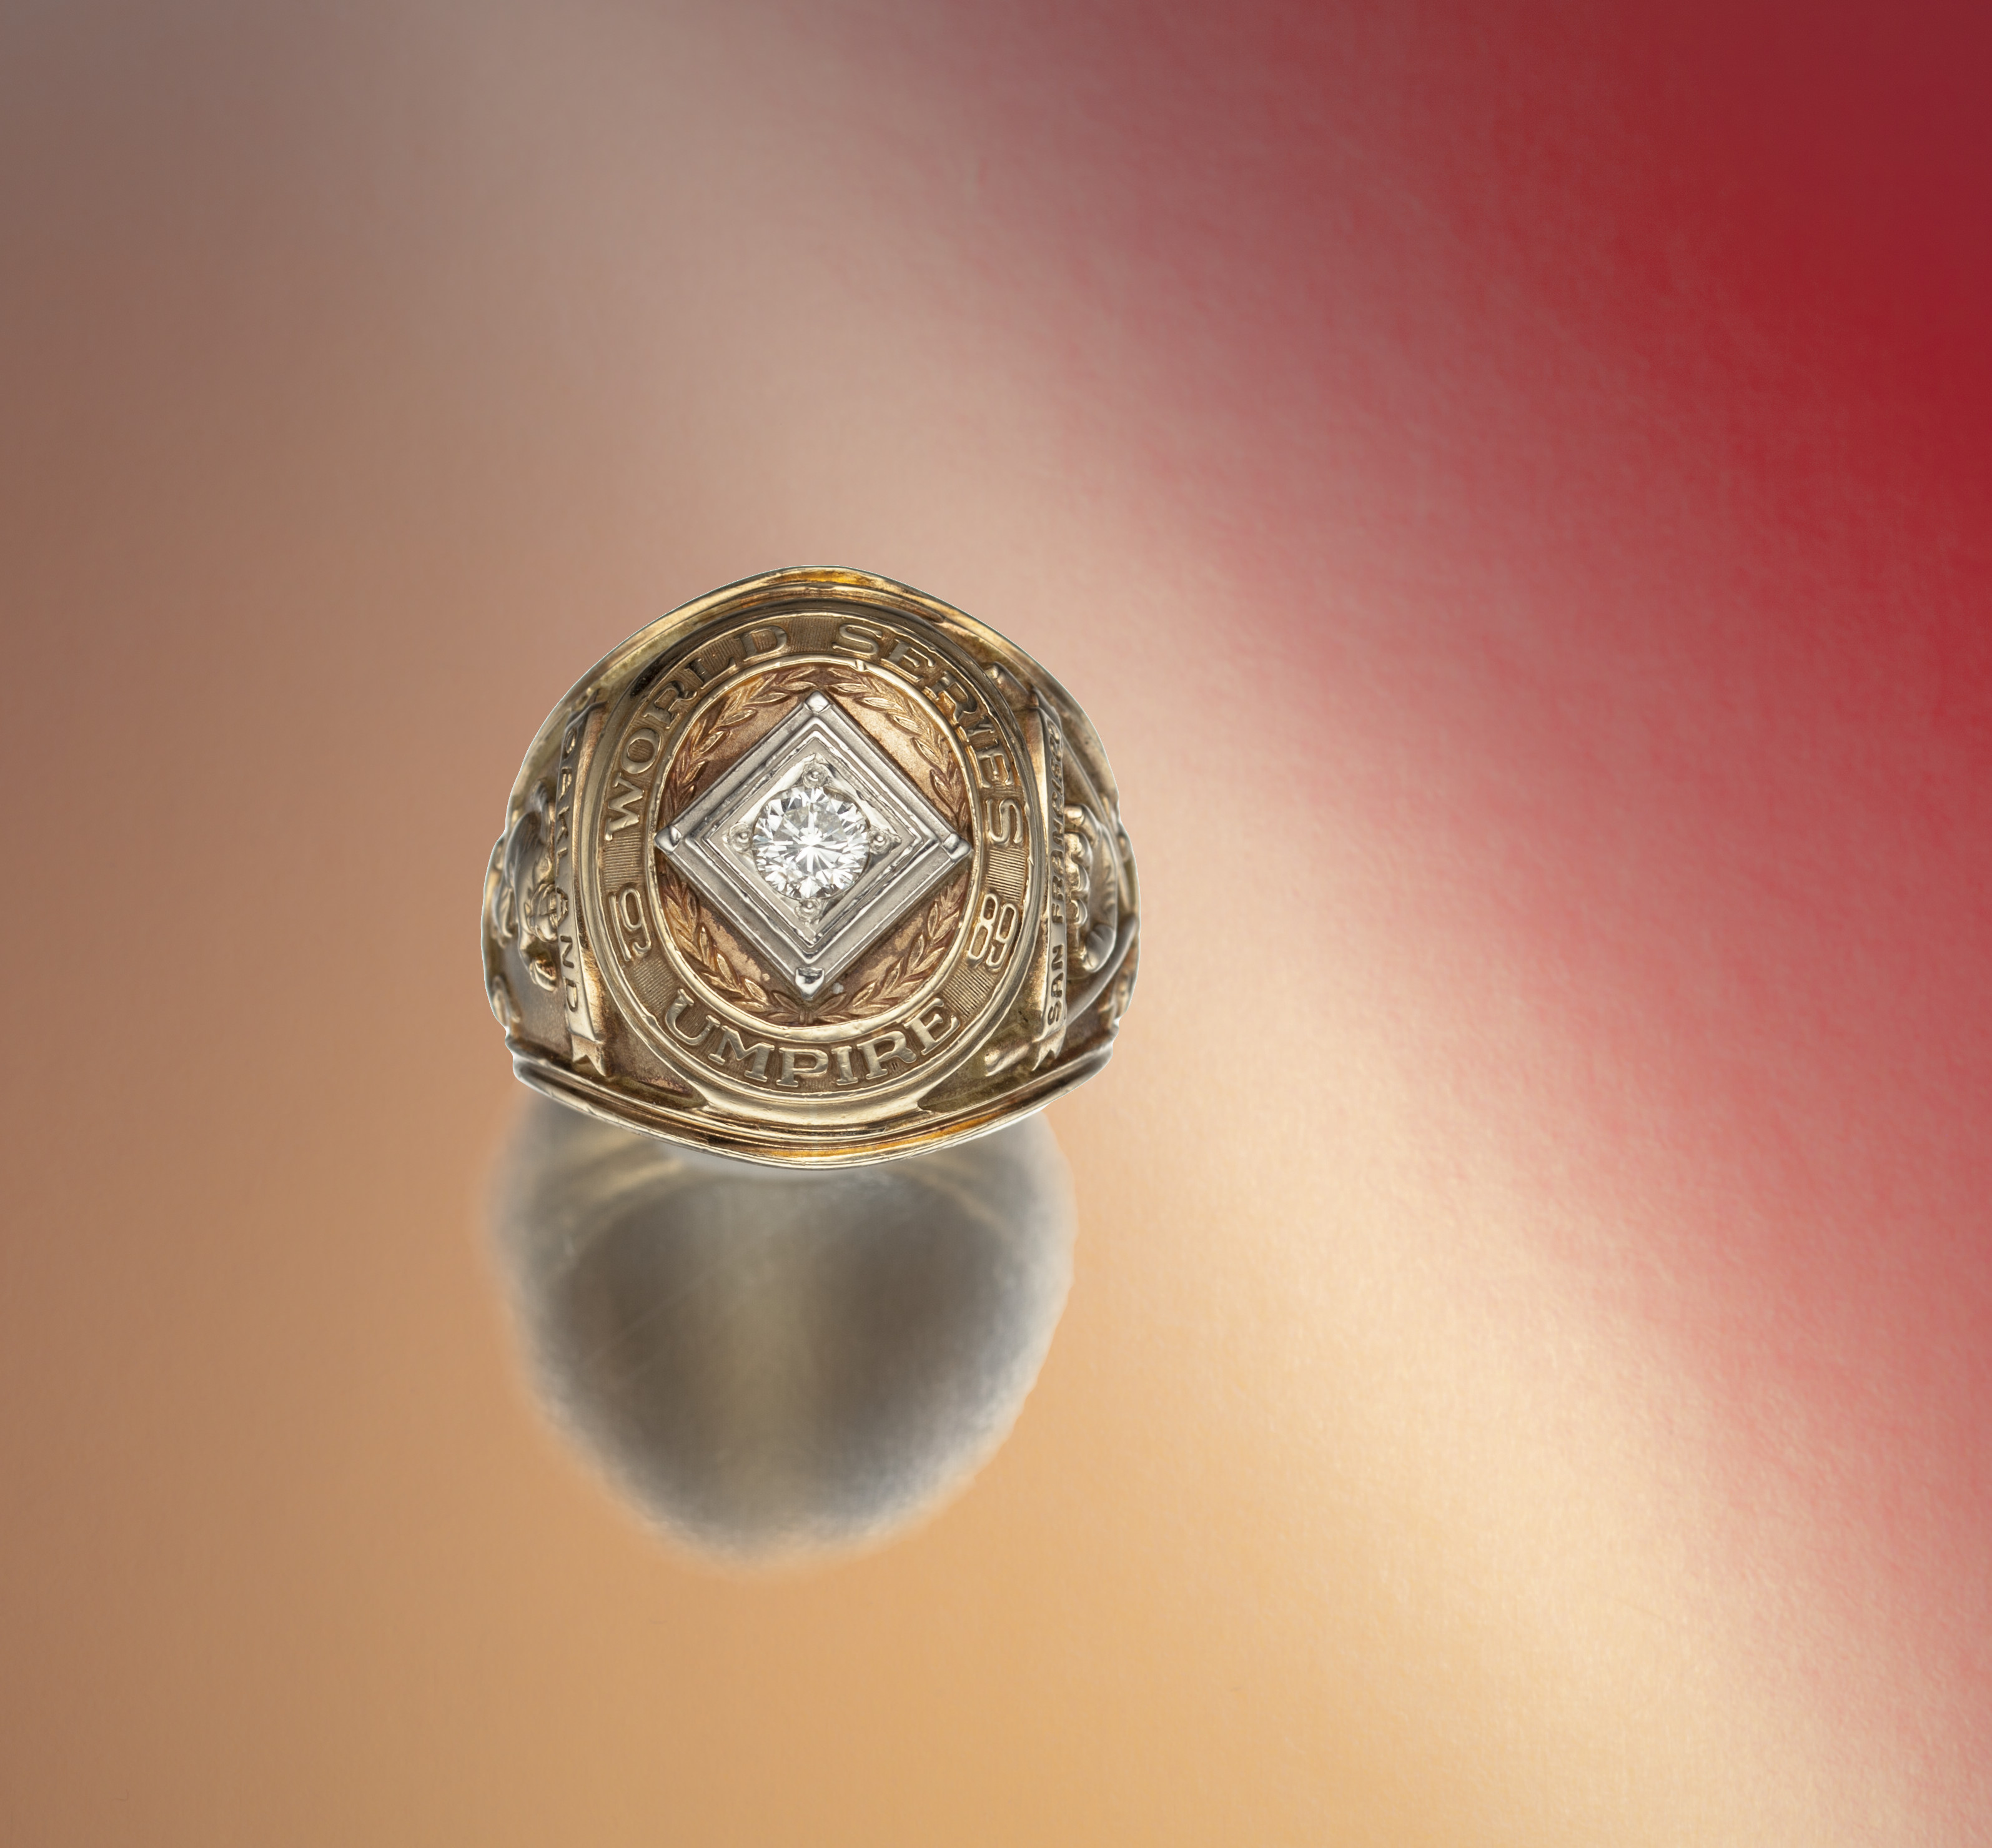 Umpire ring